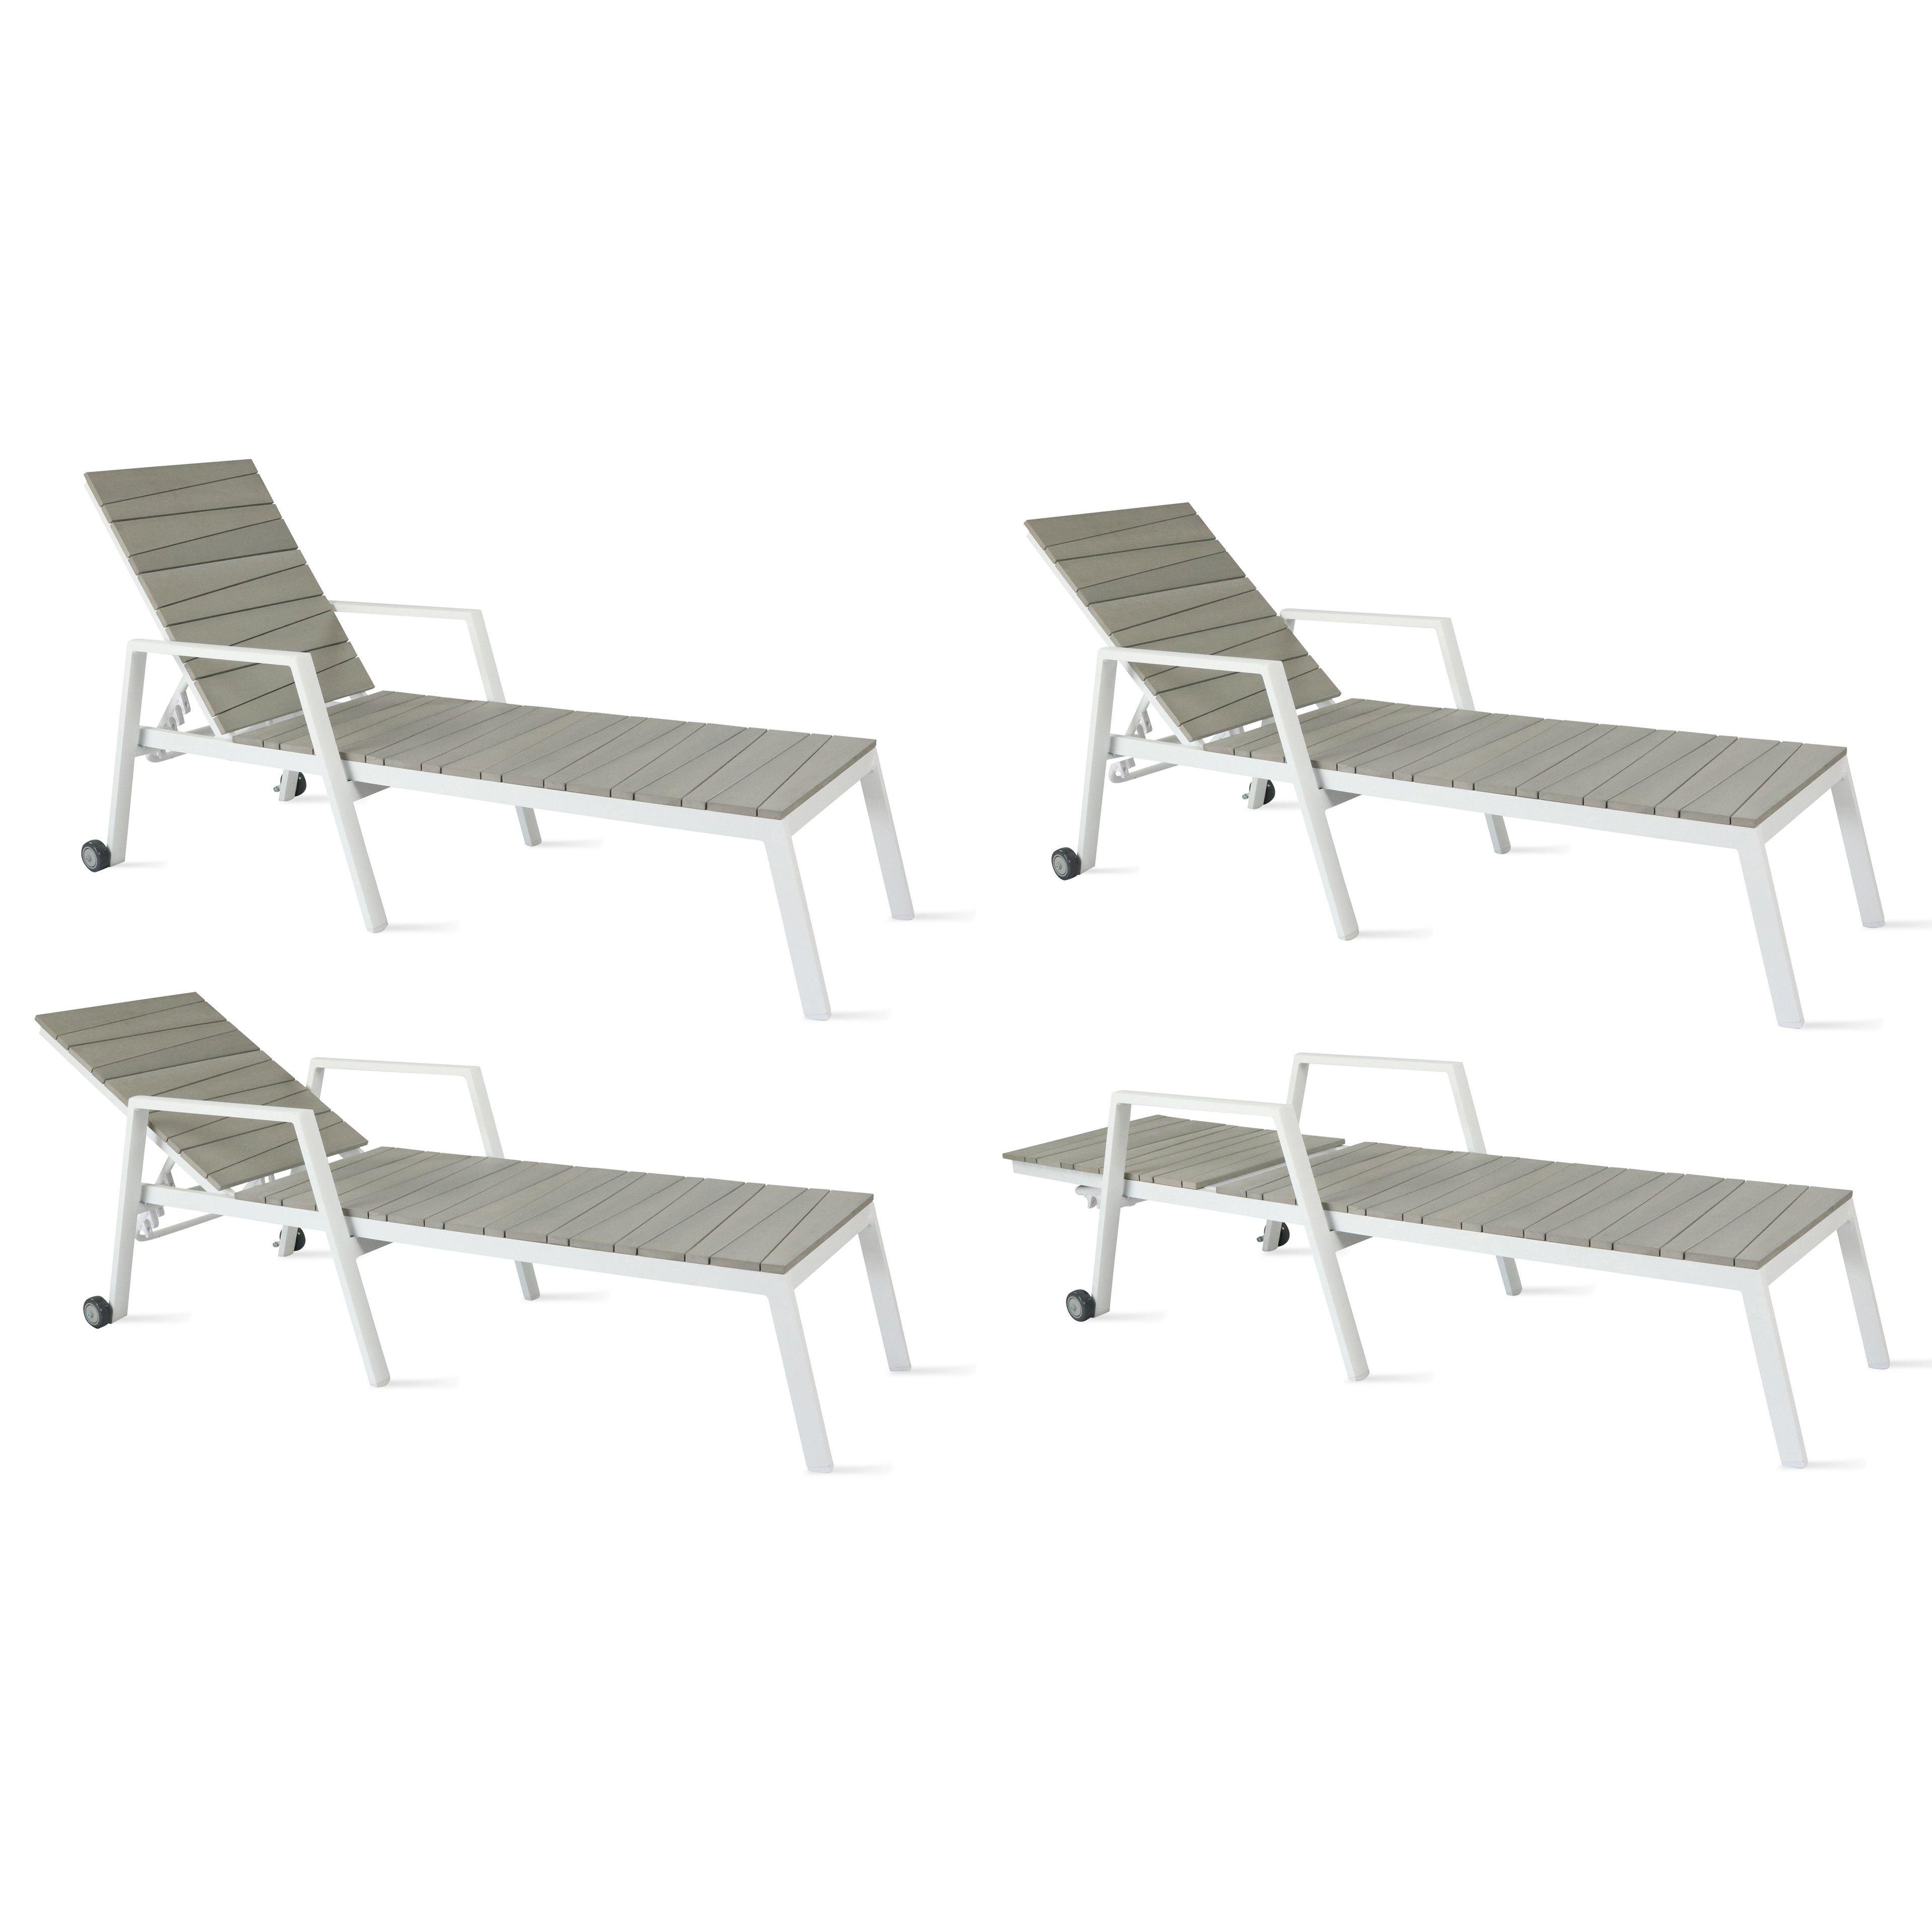 bain de soleil alu et polywood. Black Bedroom Furniture Sets. Home Design Ideas